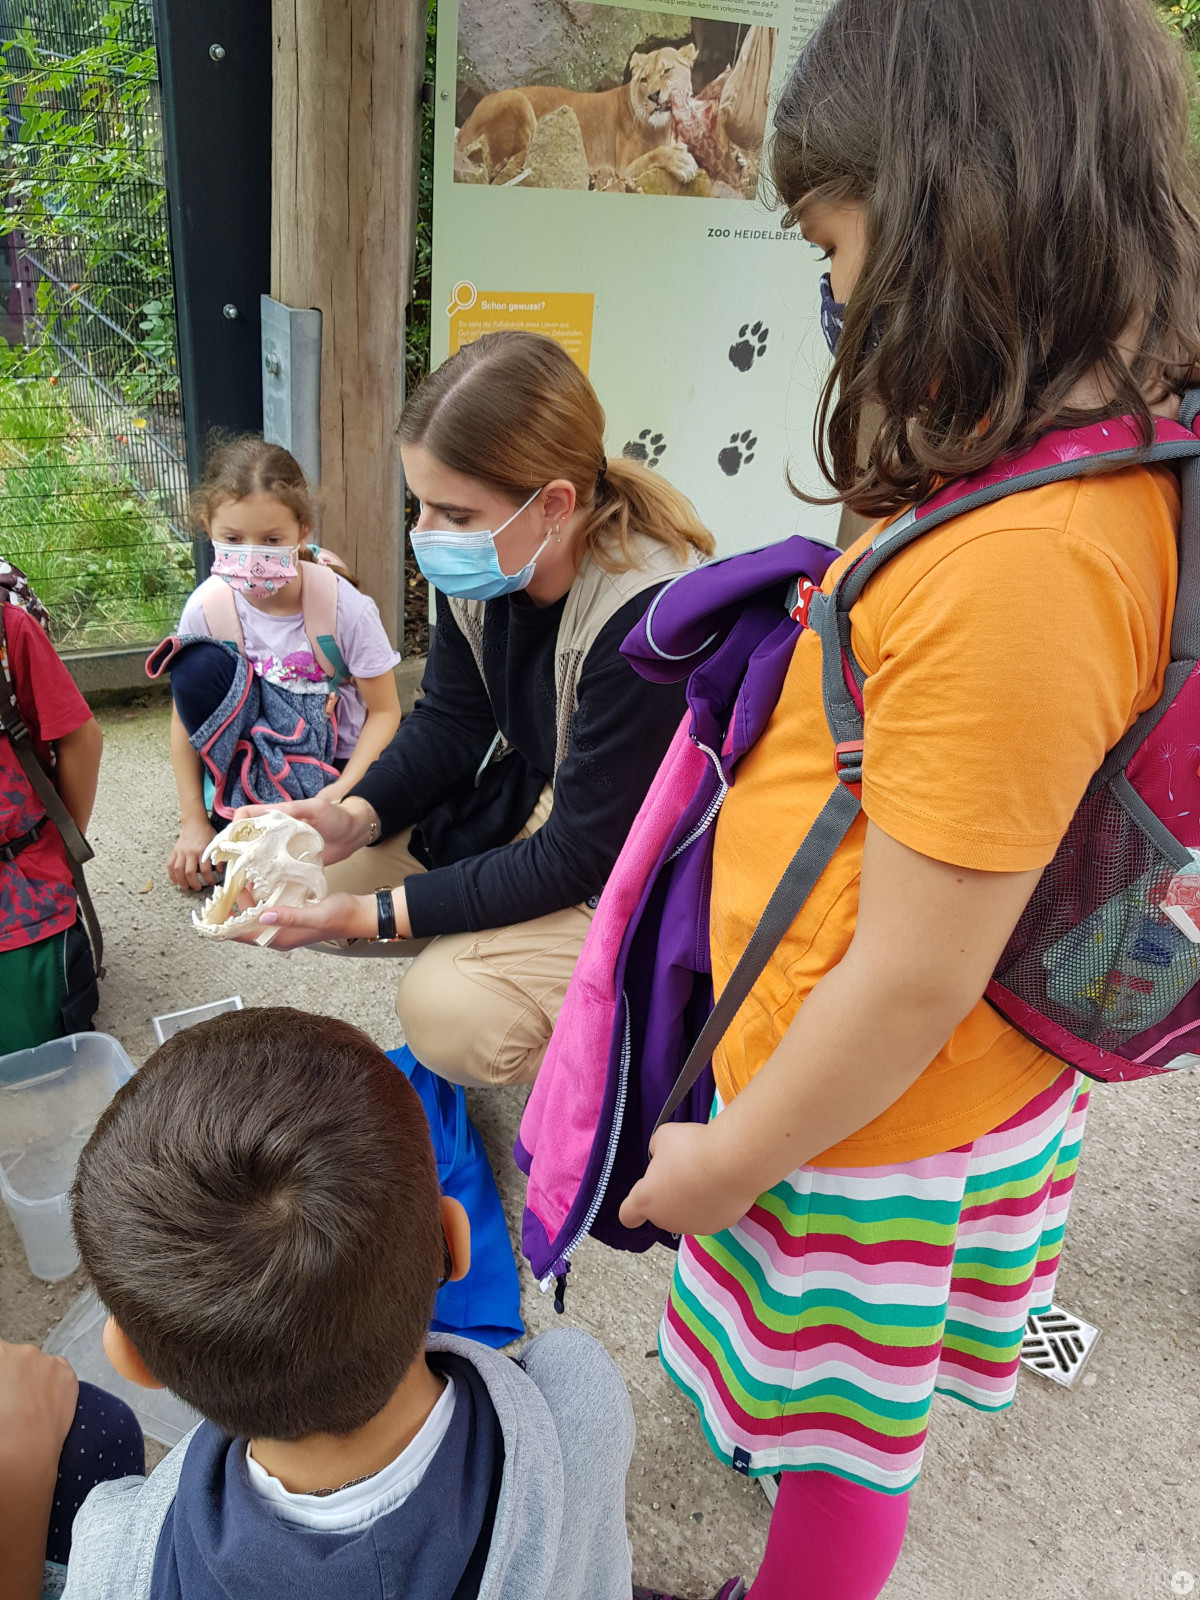 Jugendferienprogramm_Zoo-Heidelberg2